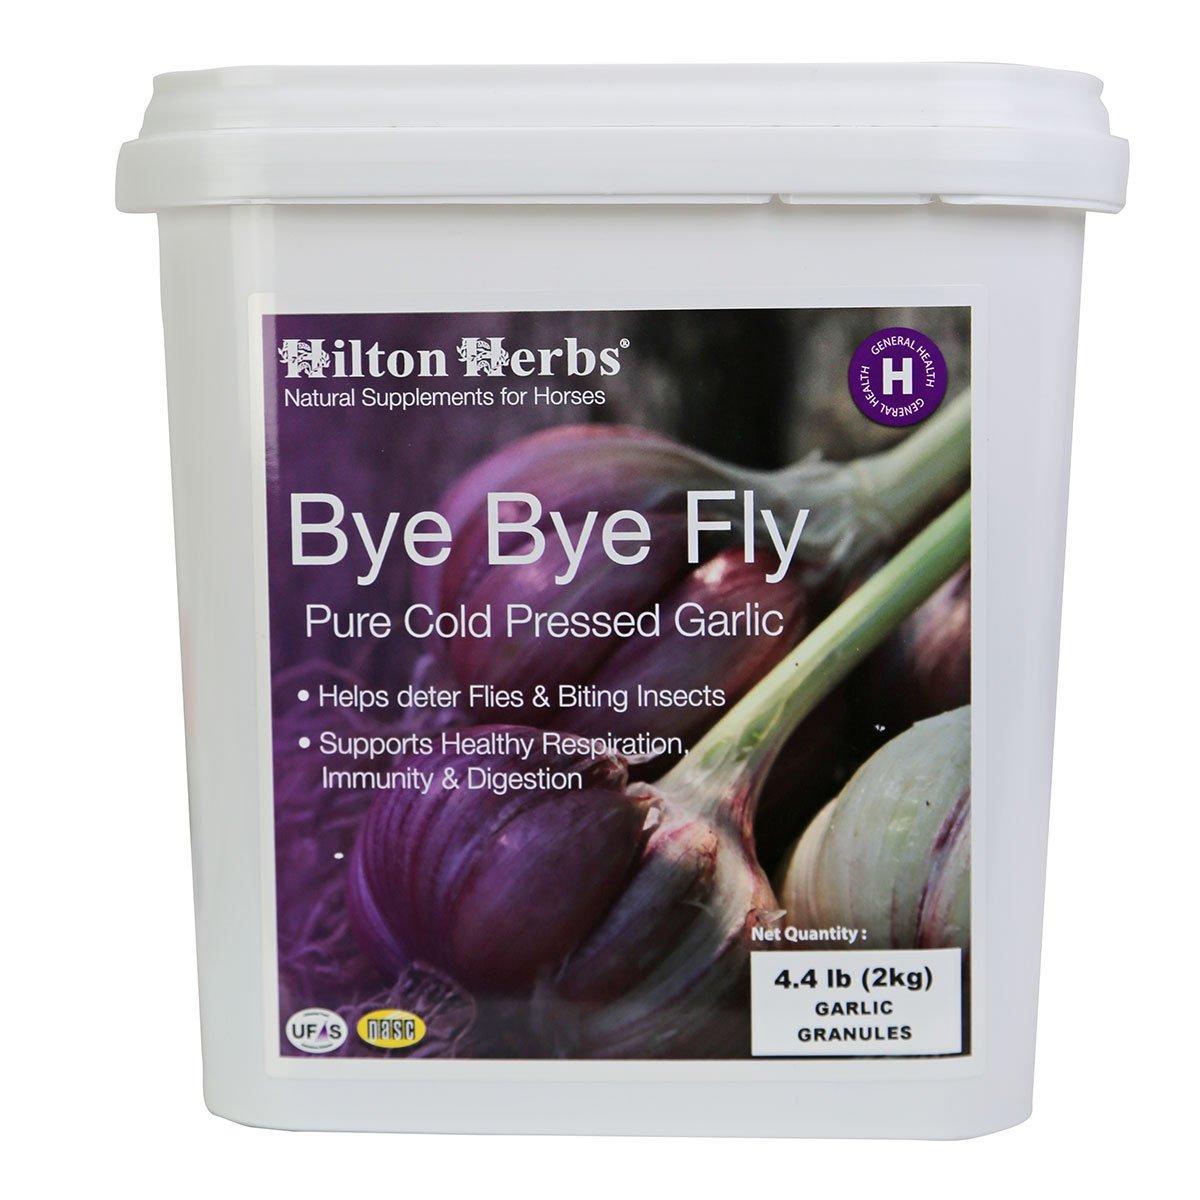 Hilton Herbs Bye Bye Fly Garlic Granules 4.4 lbs by Hilton Herbs